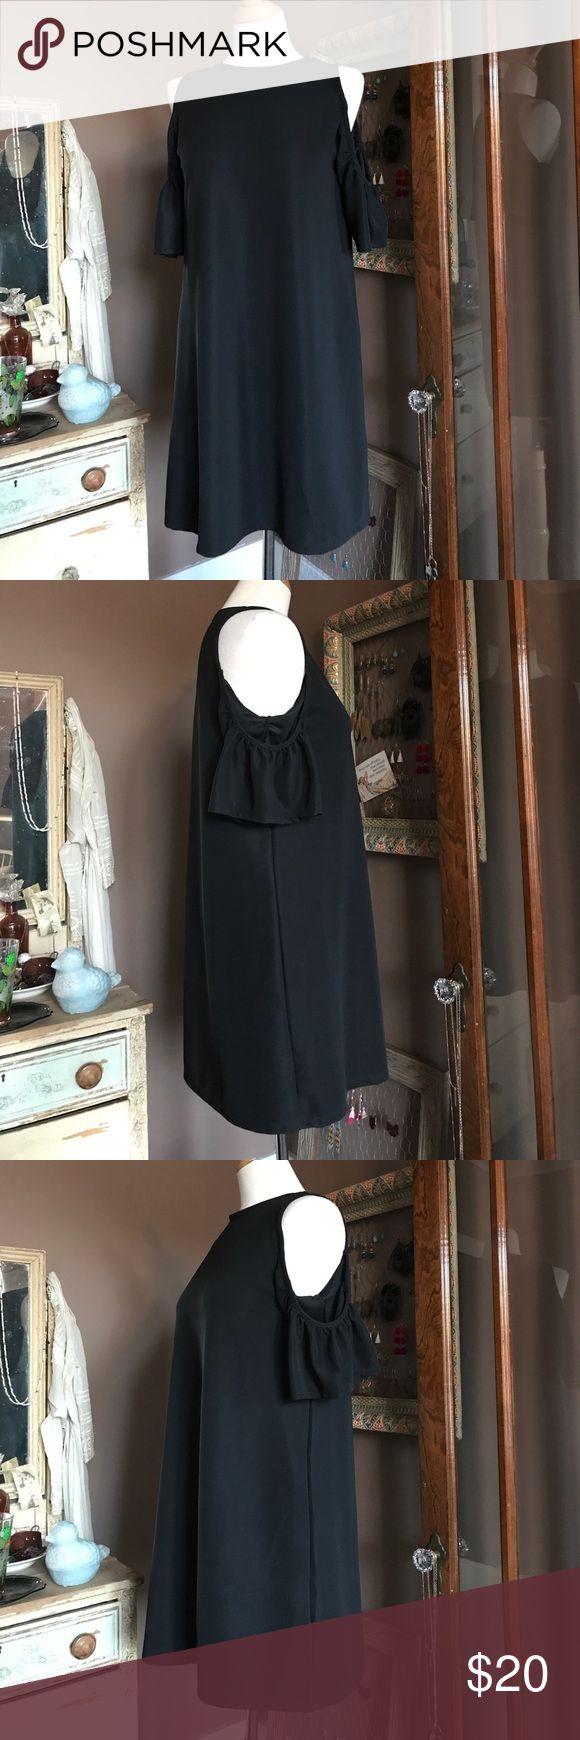 Black dress zara meaning